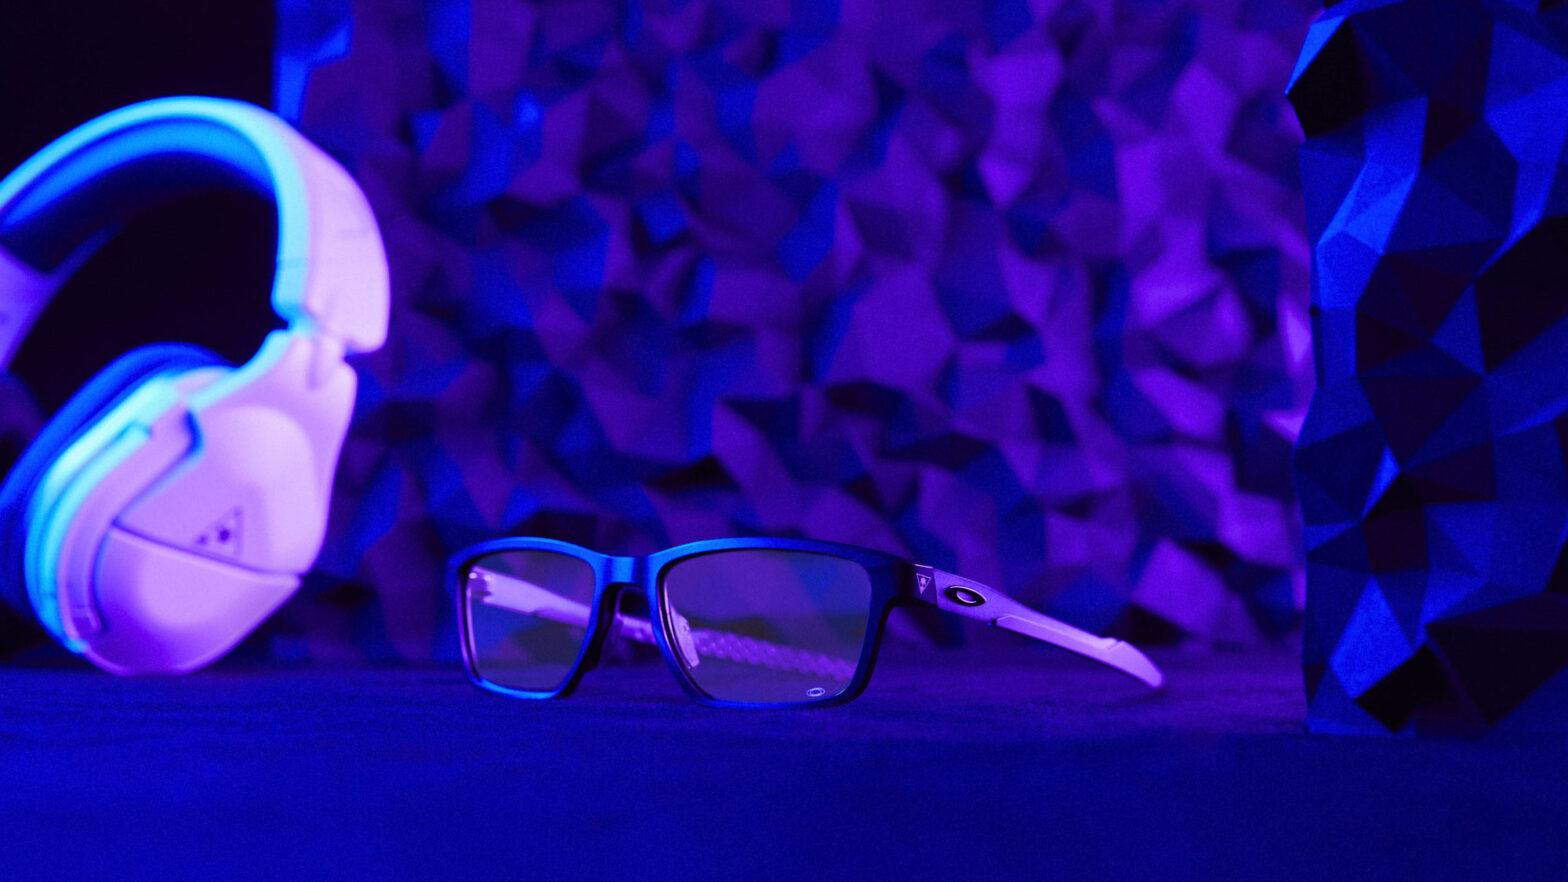 Oakley x Turtle Beach Eyewear Collection